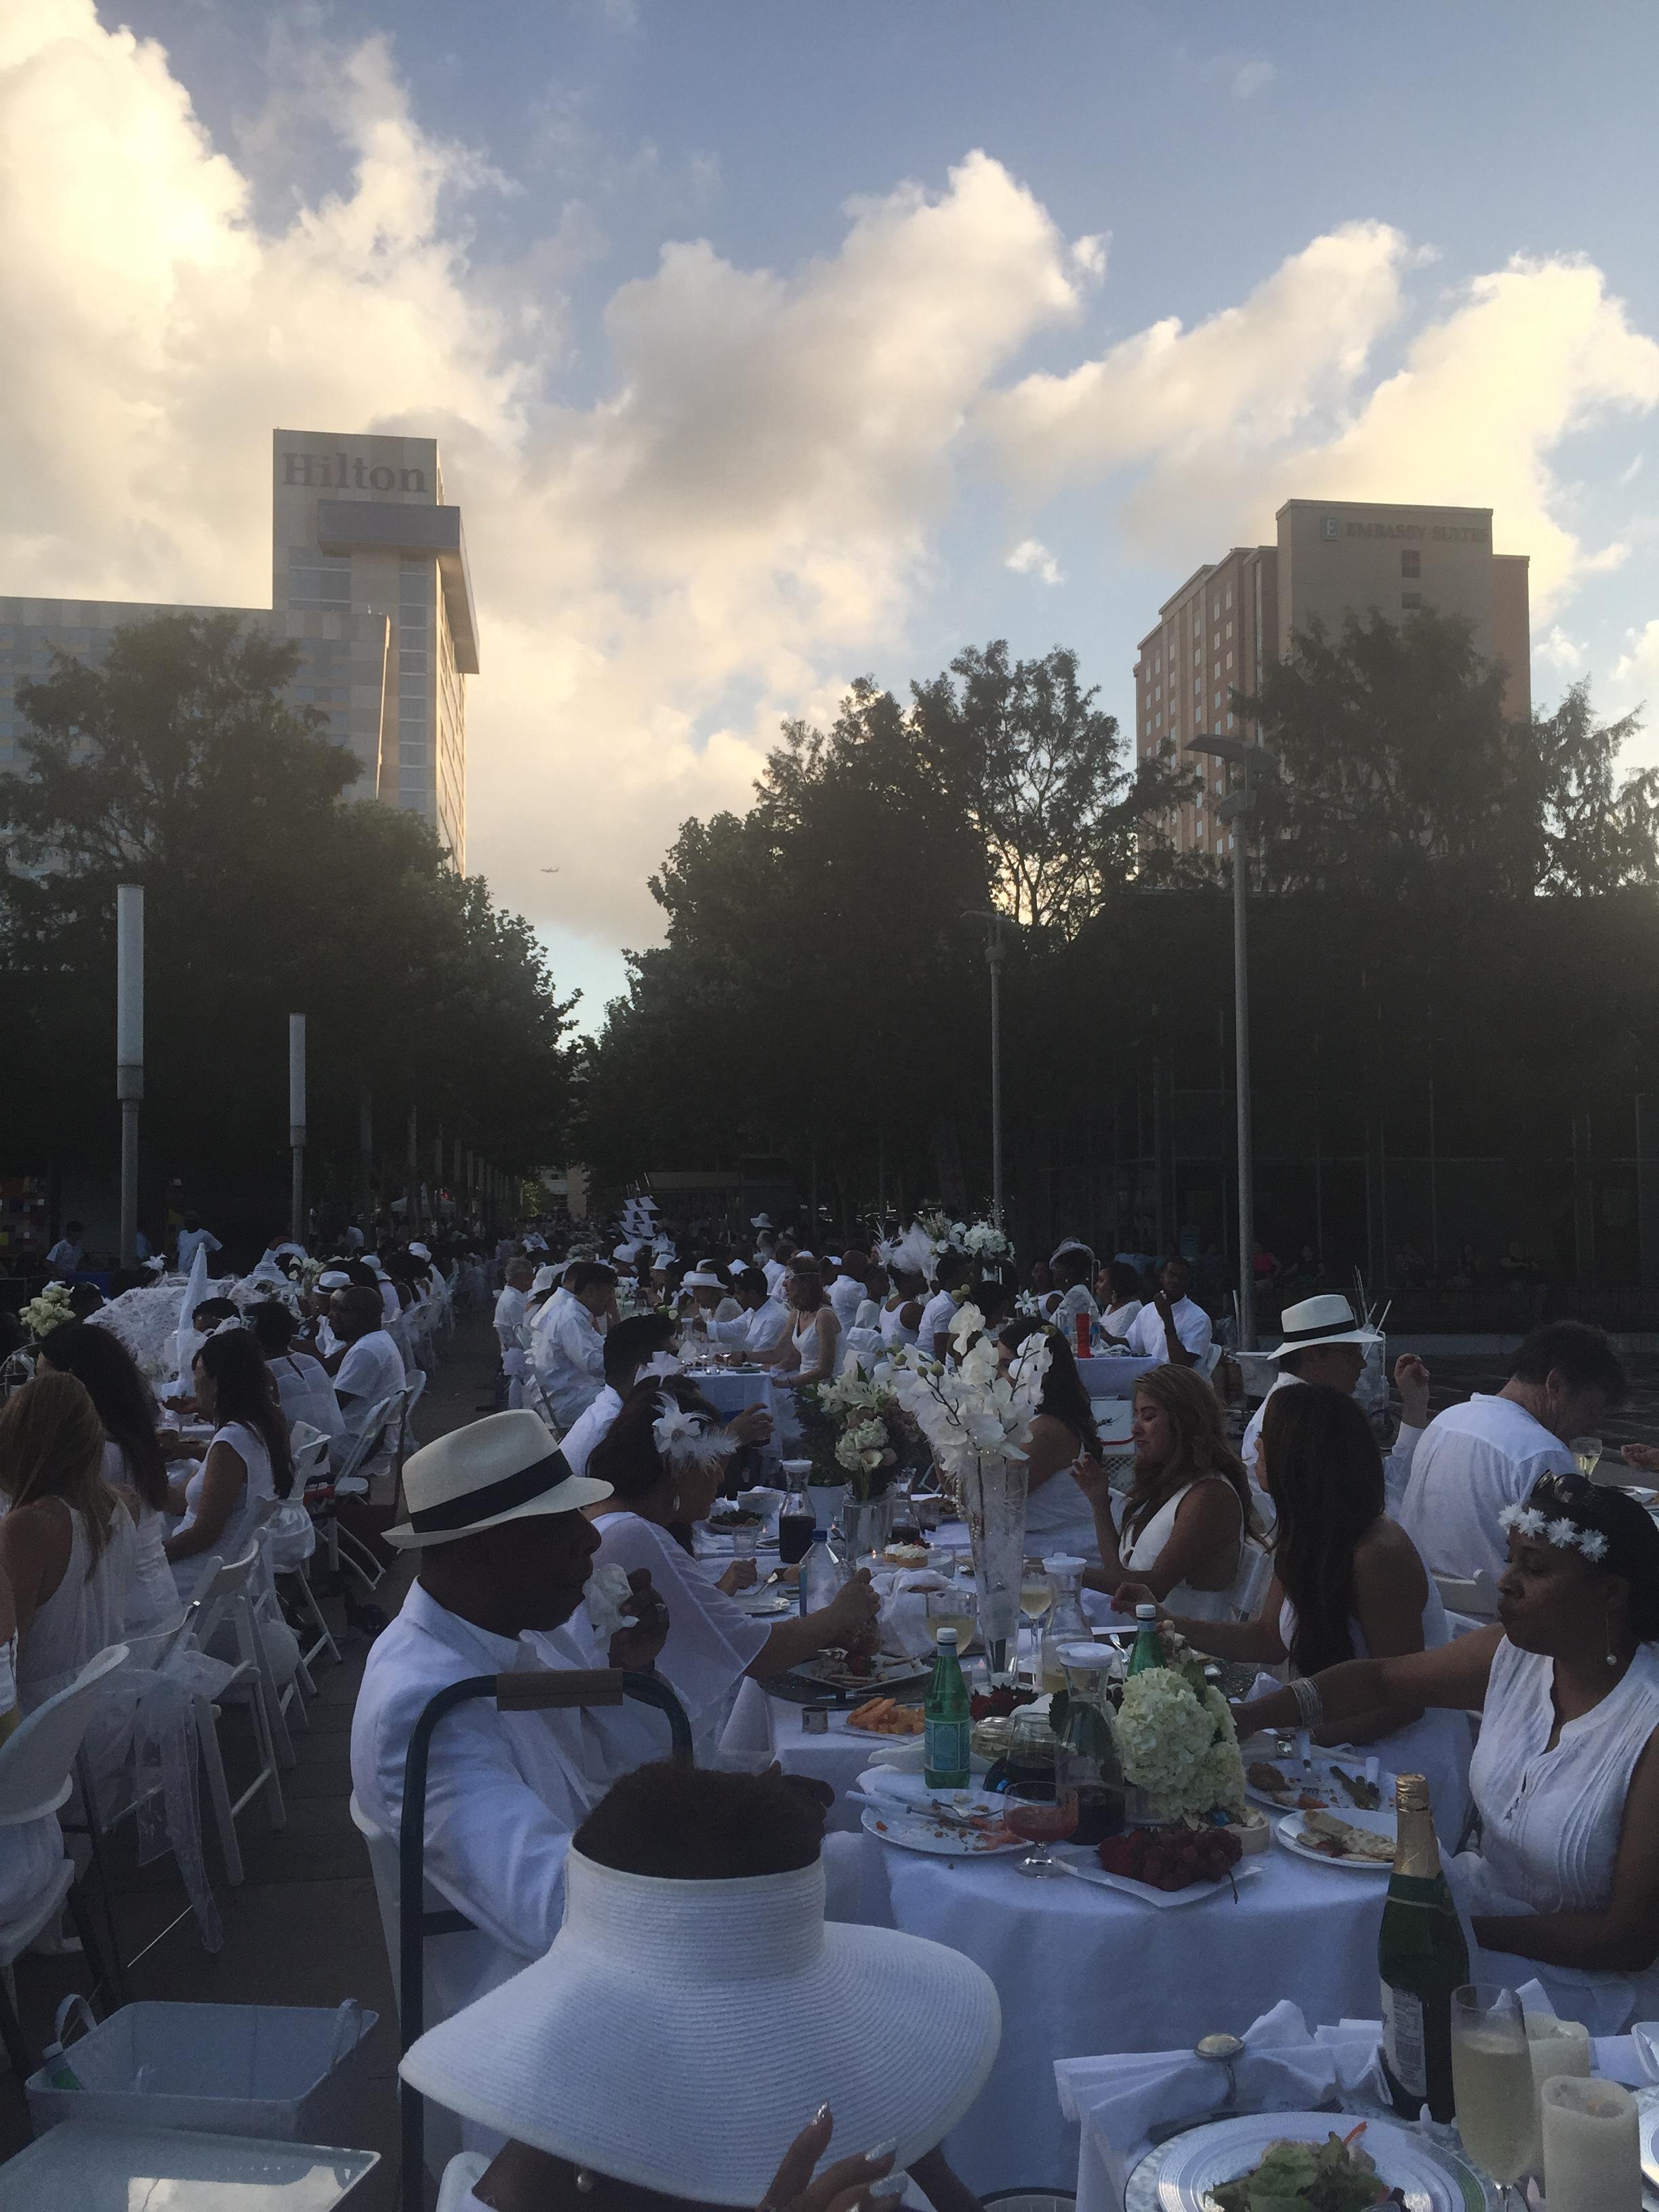 Diner En Blanc: The Preparations